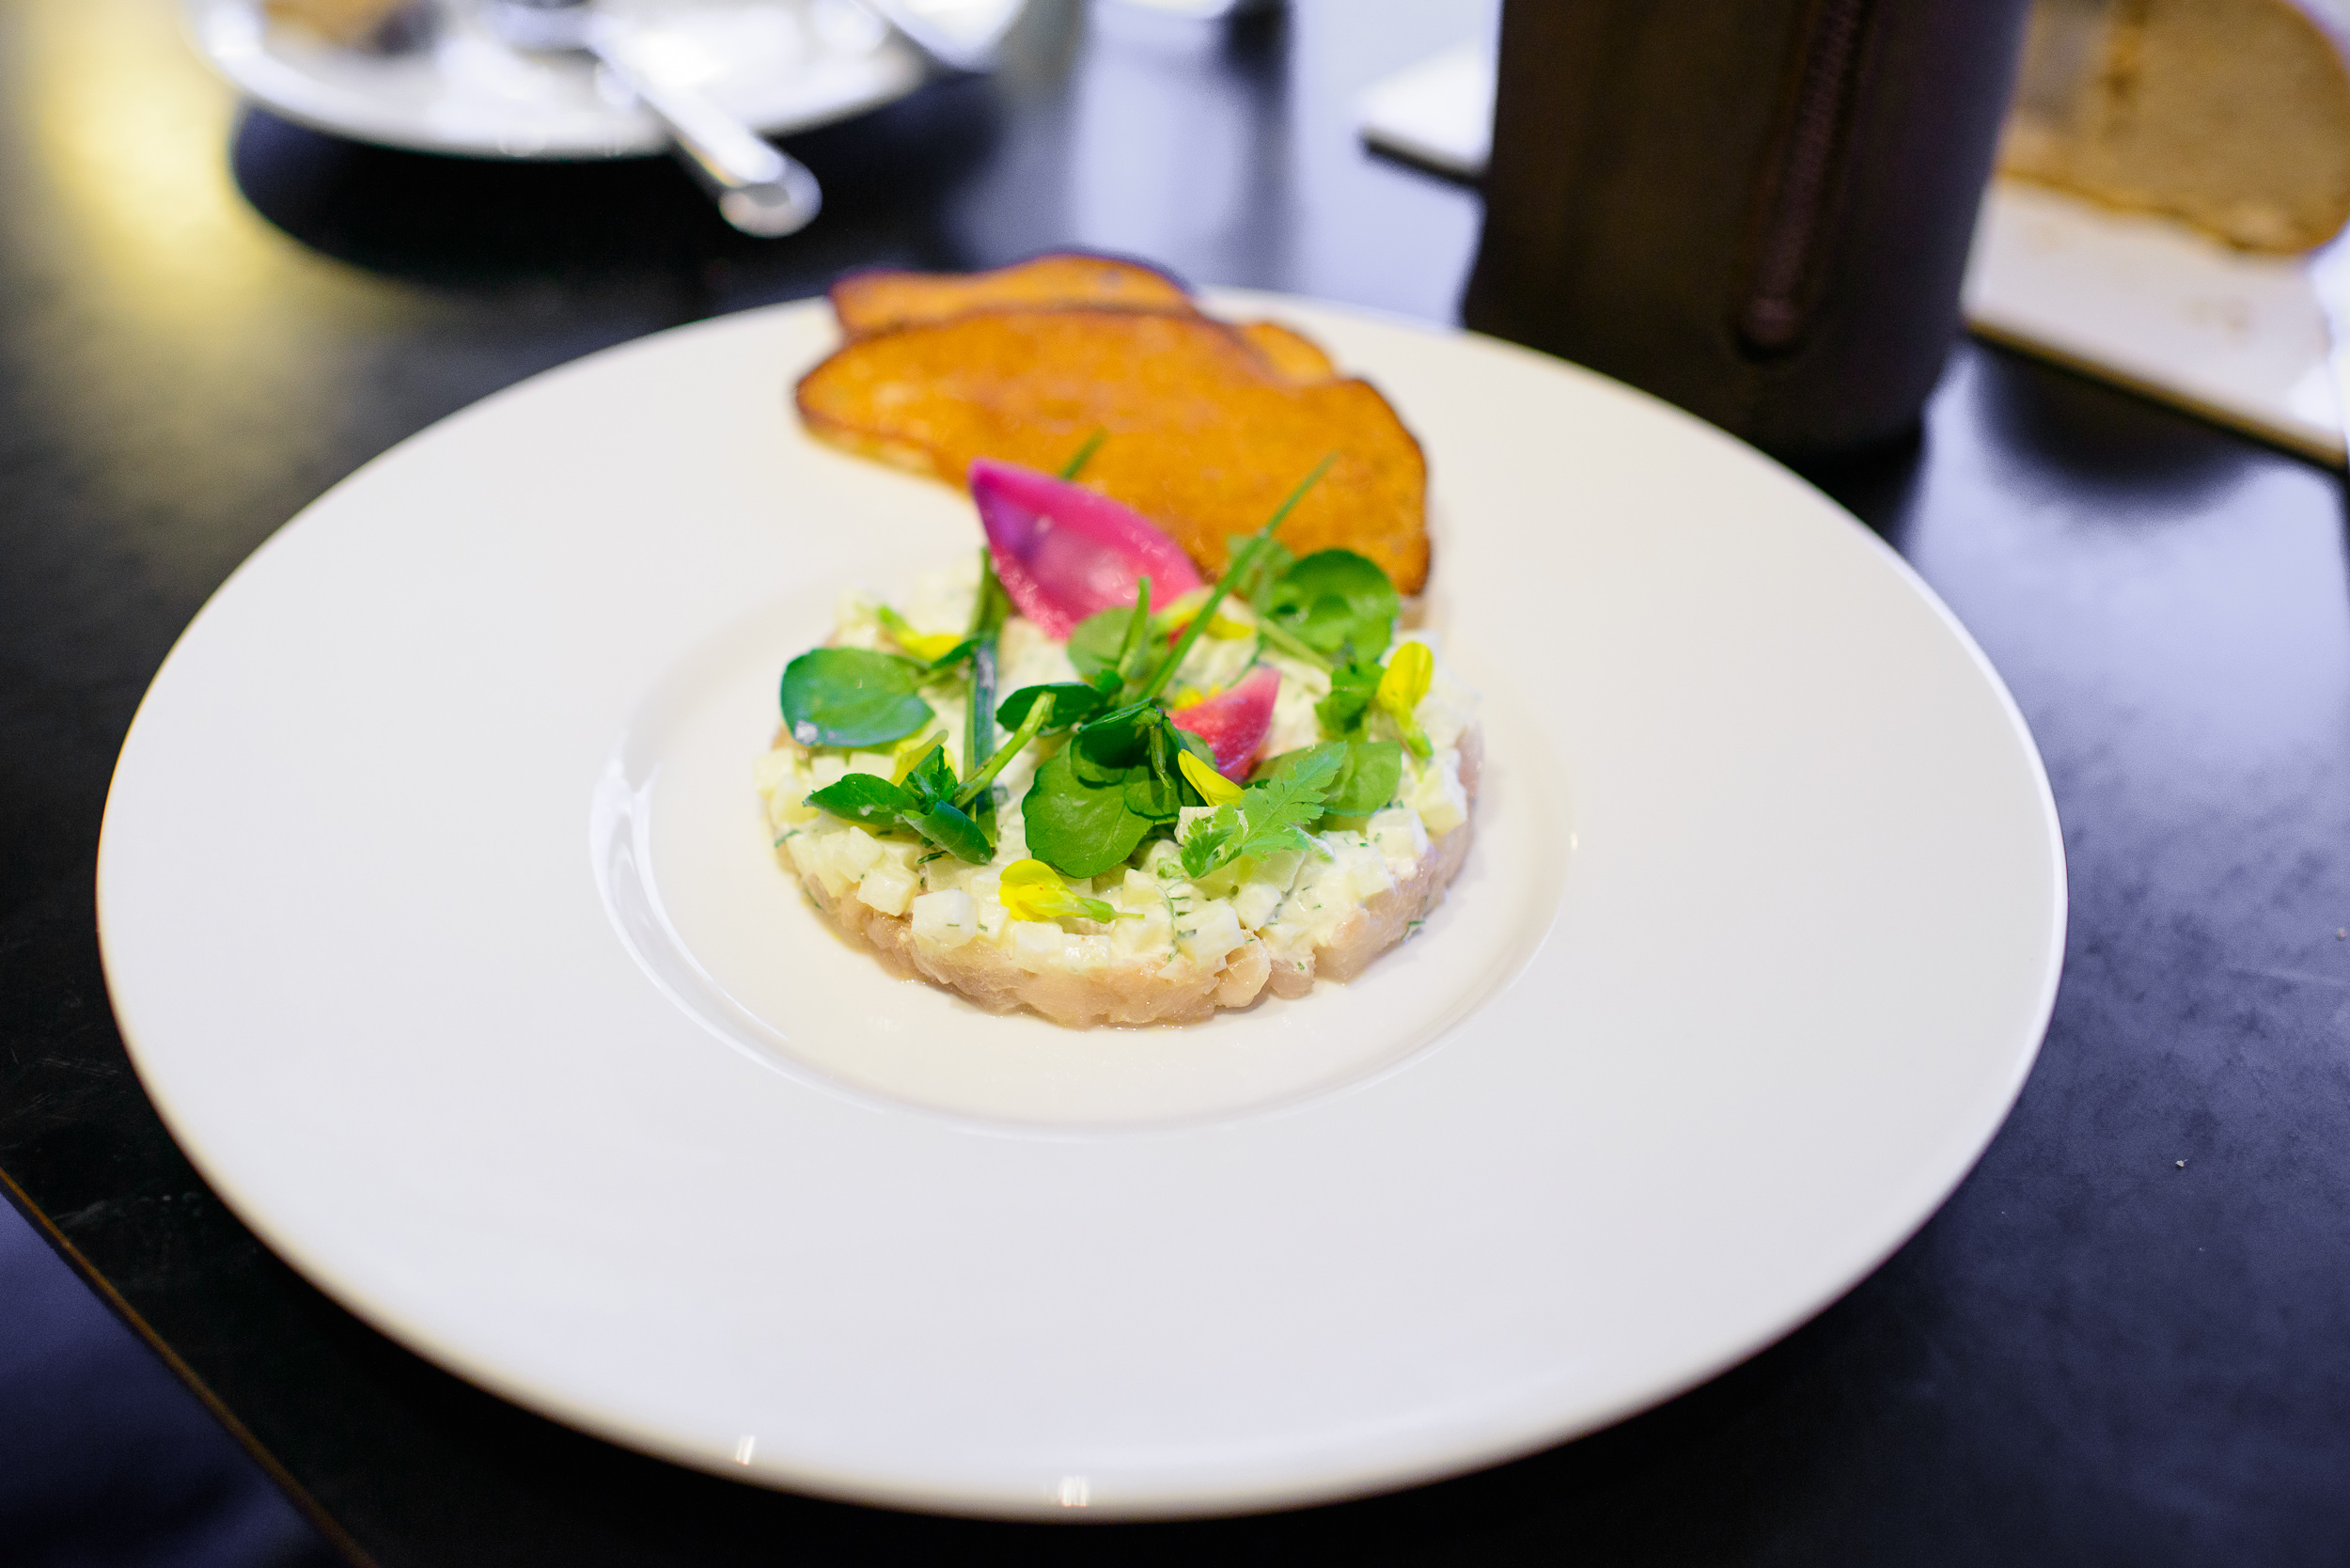 Mackerel from Norway, tartar, pickled potatoes, water cress, spr